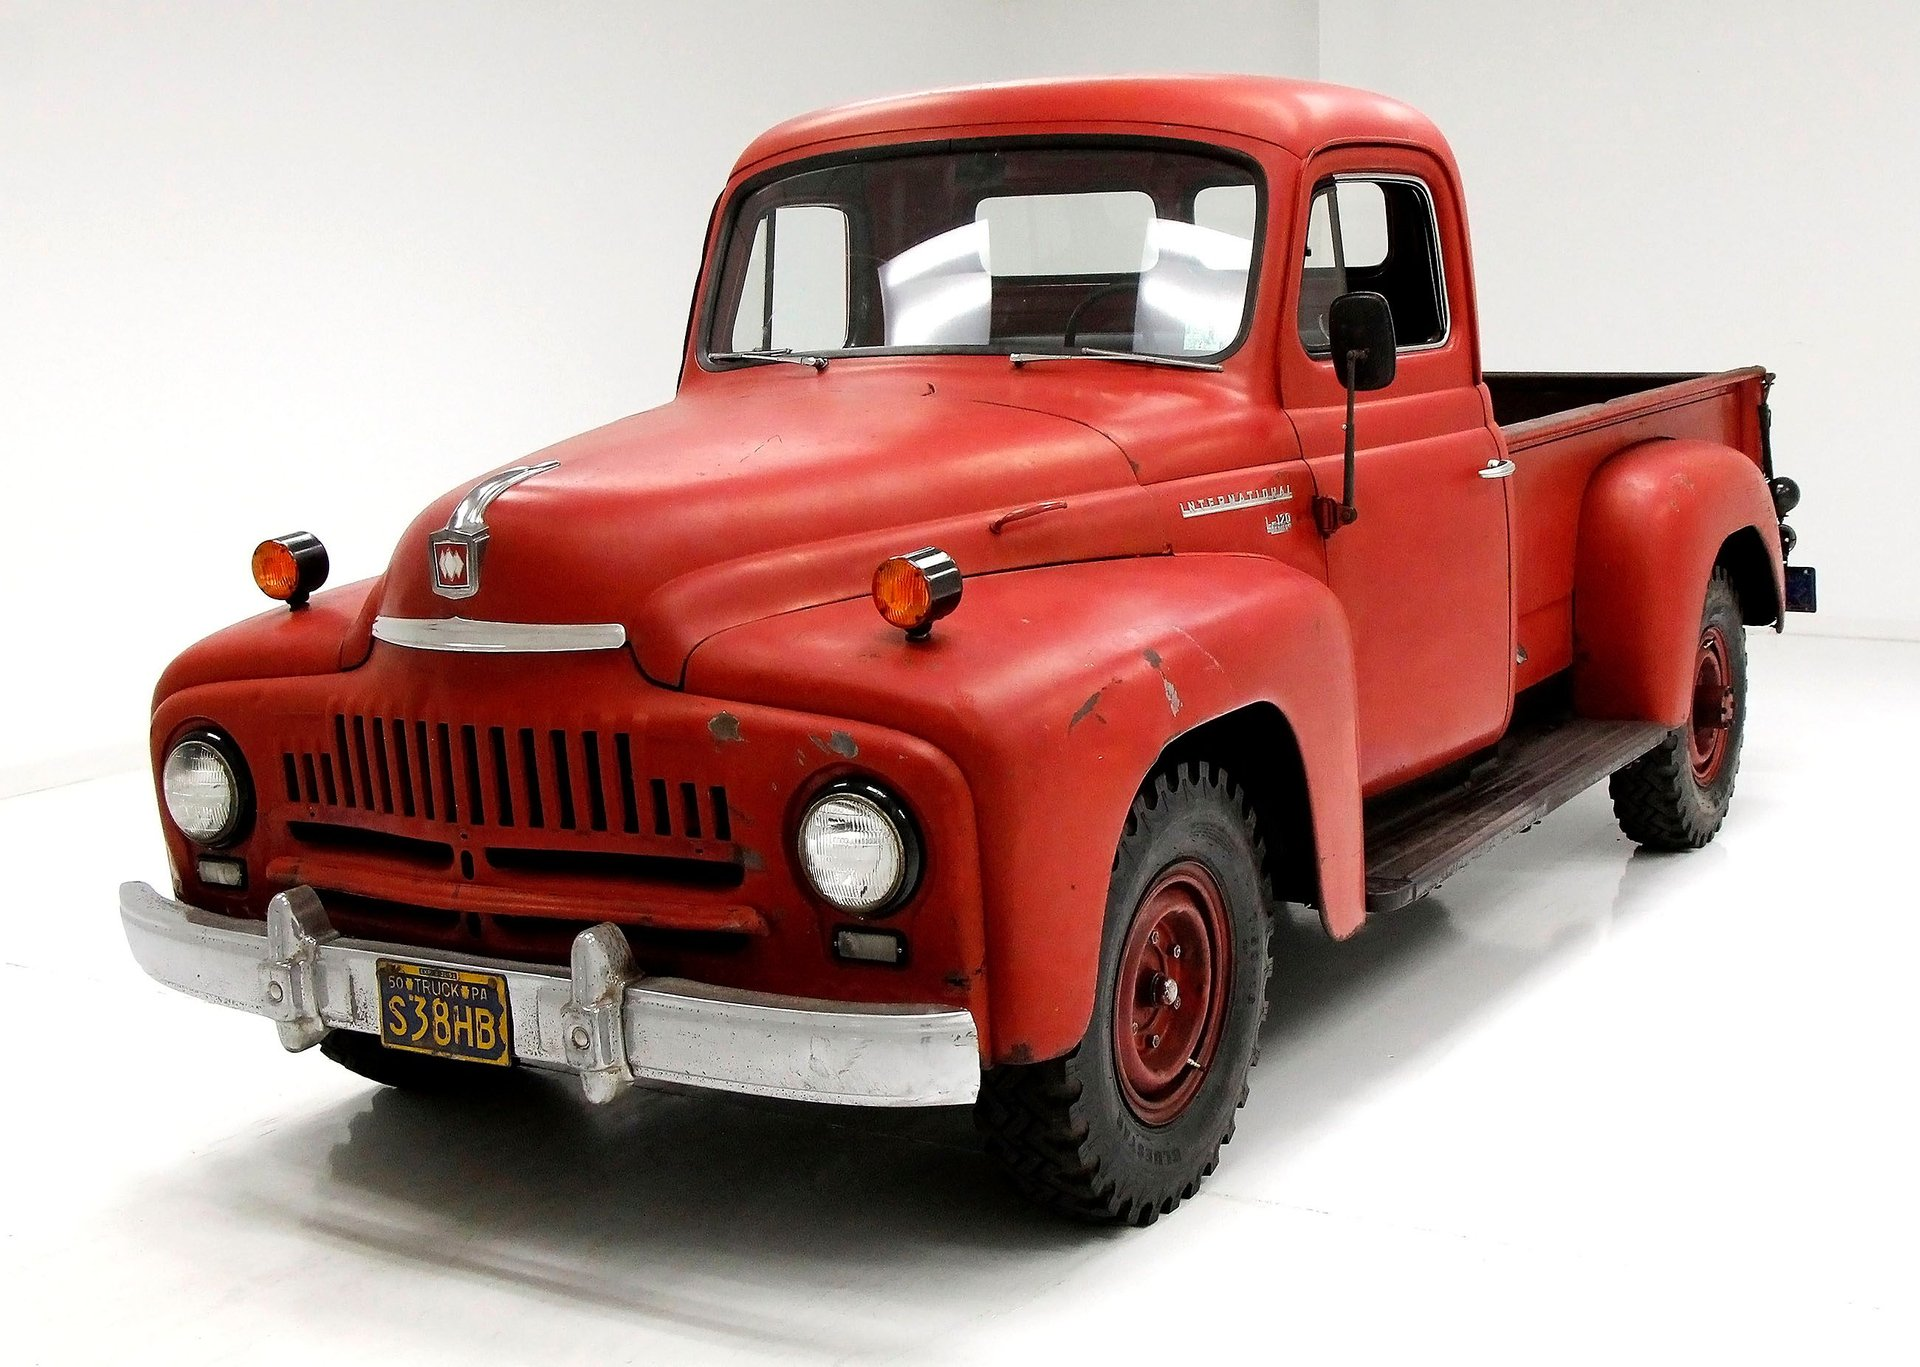 1950 International L-120